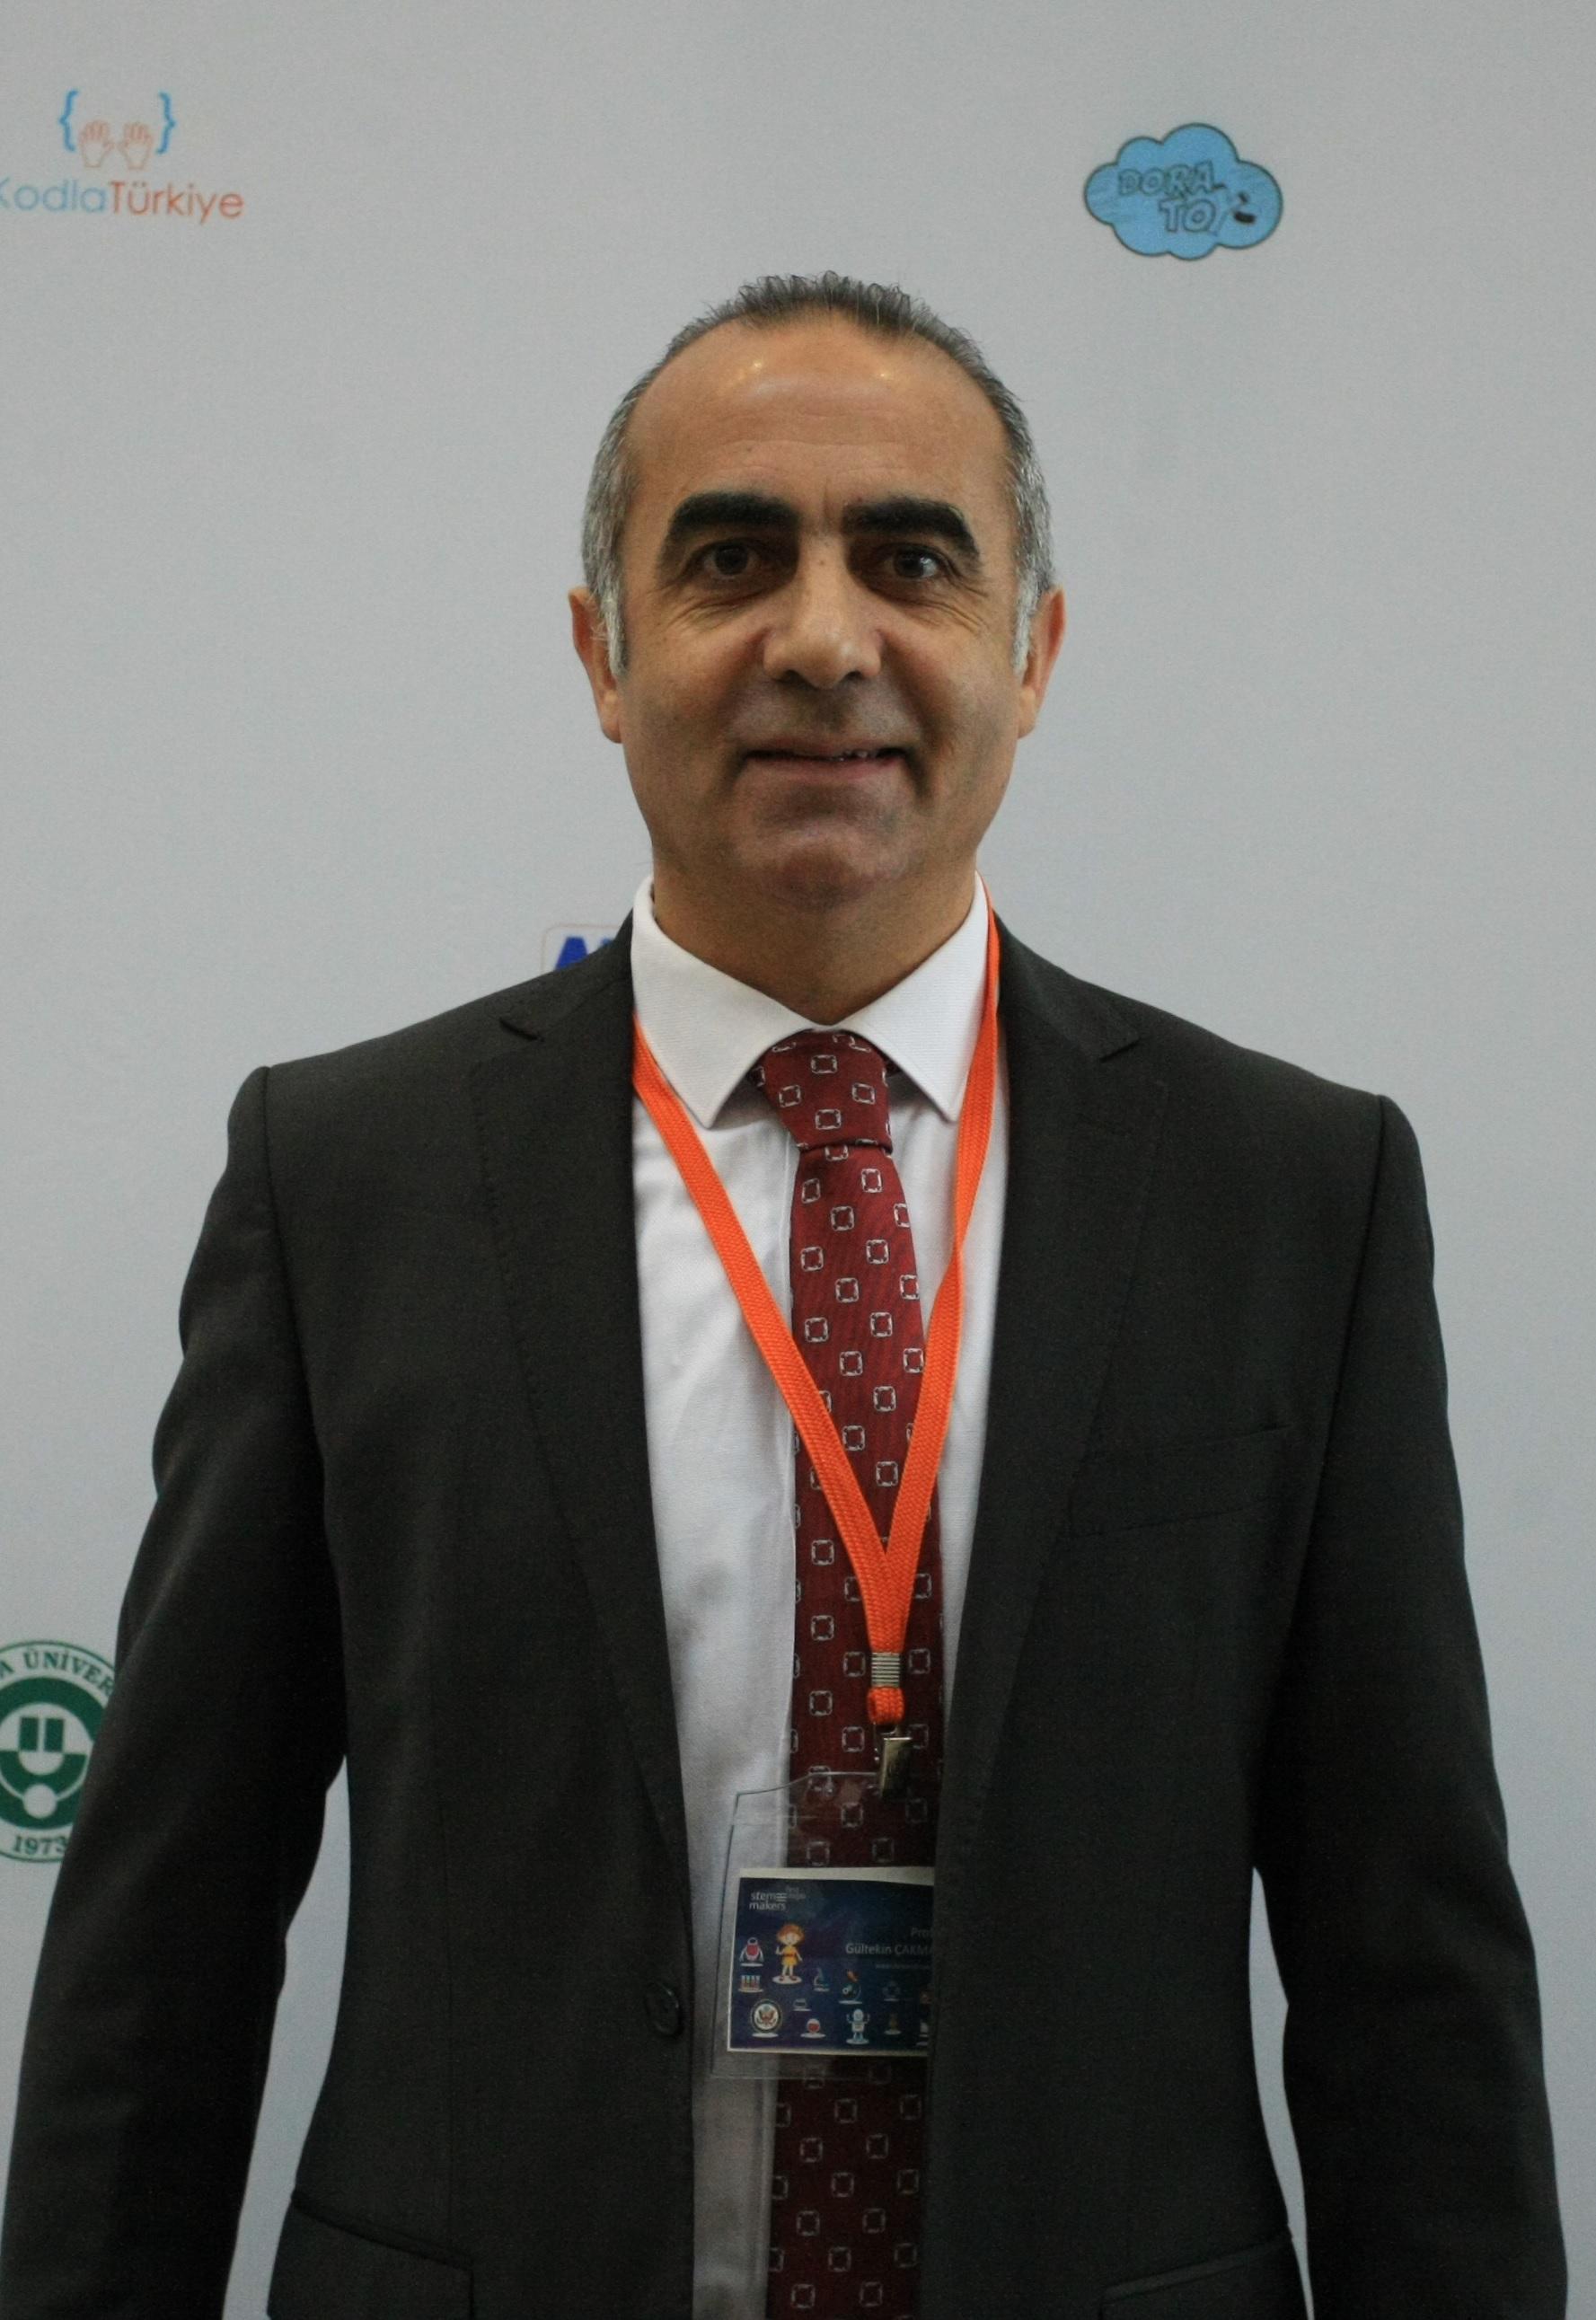 Gultekin Cakmakci